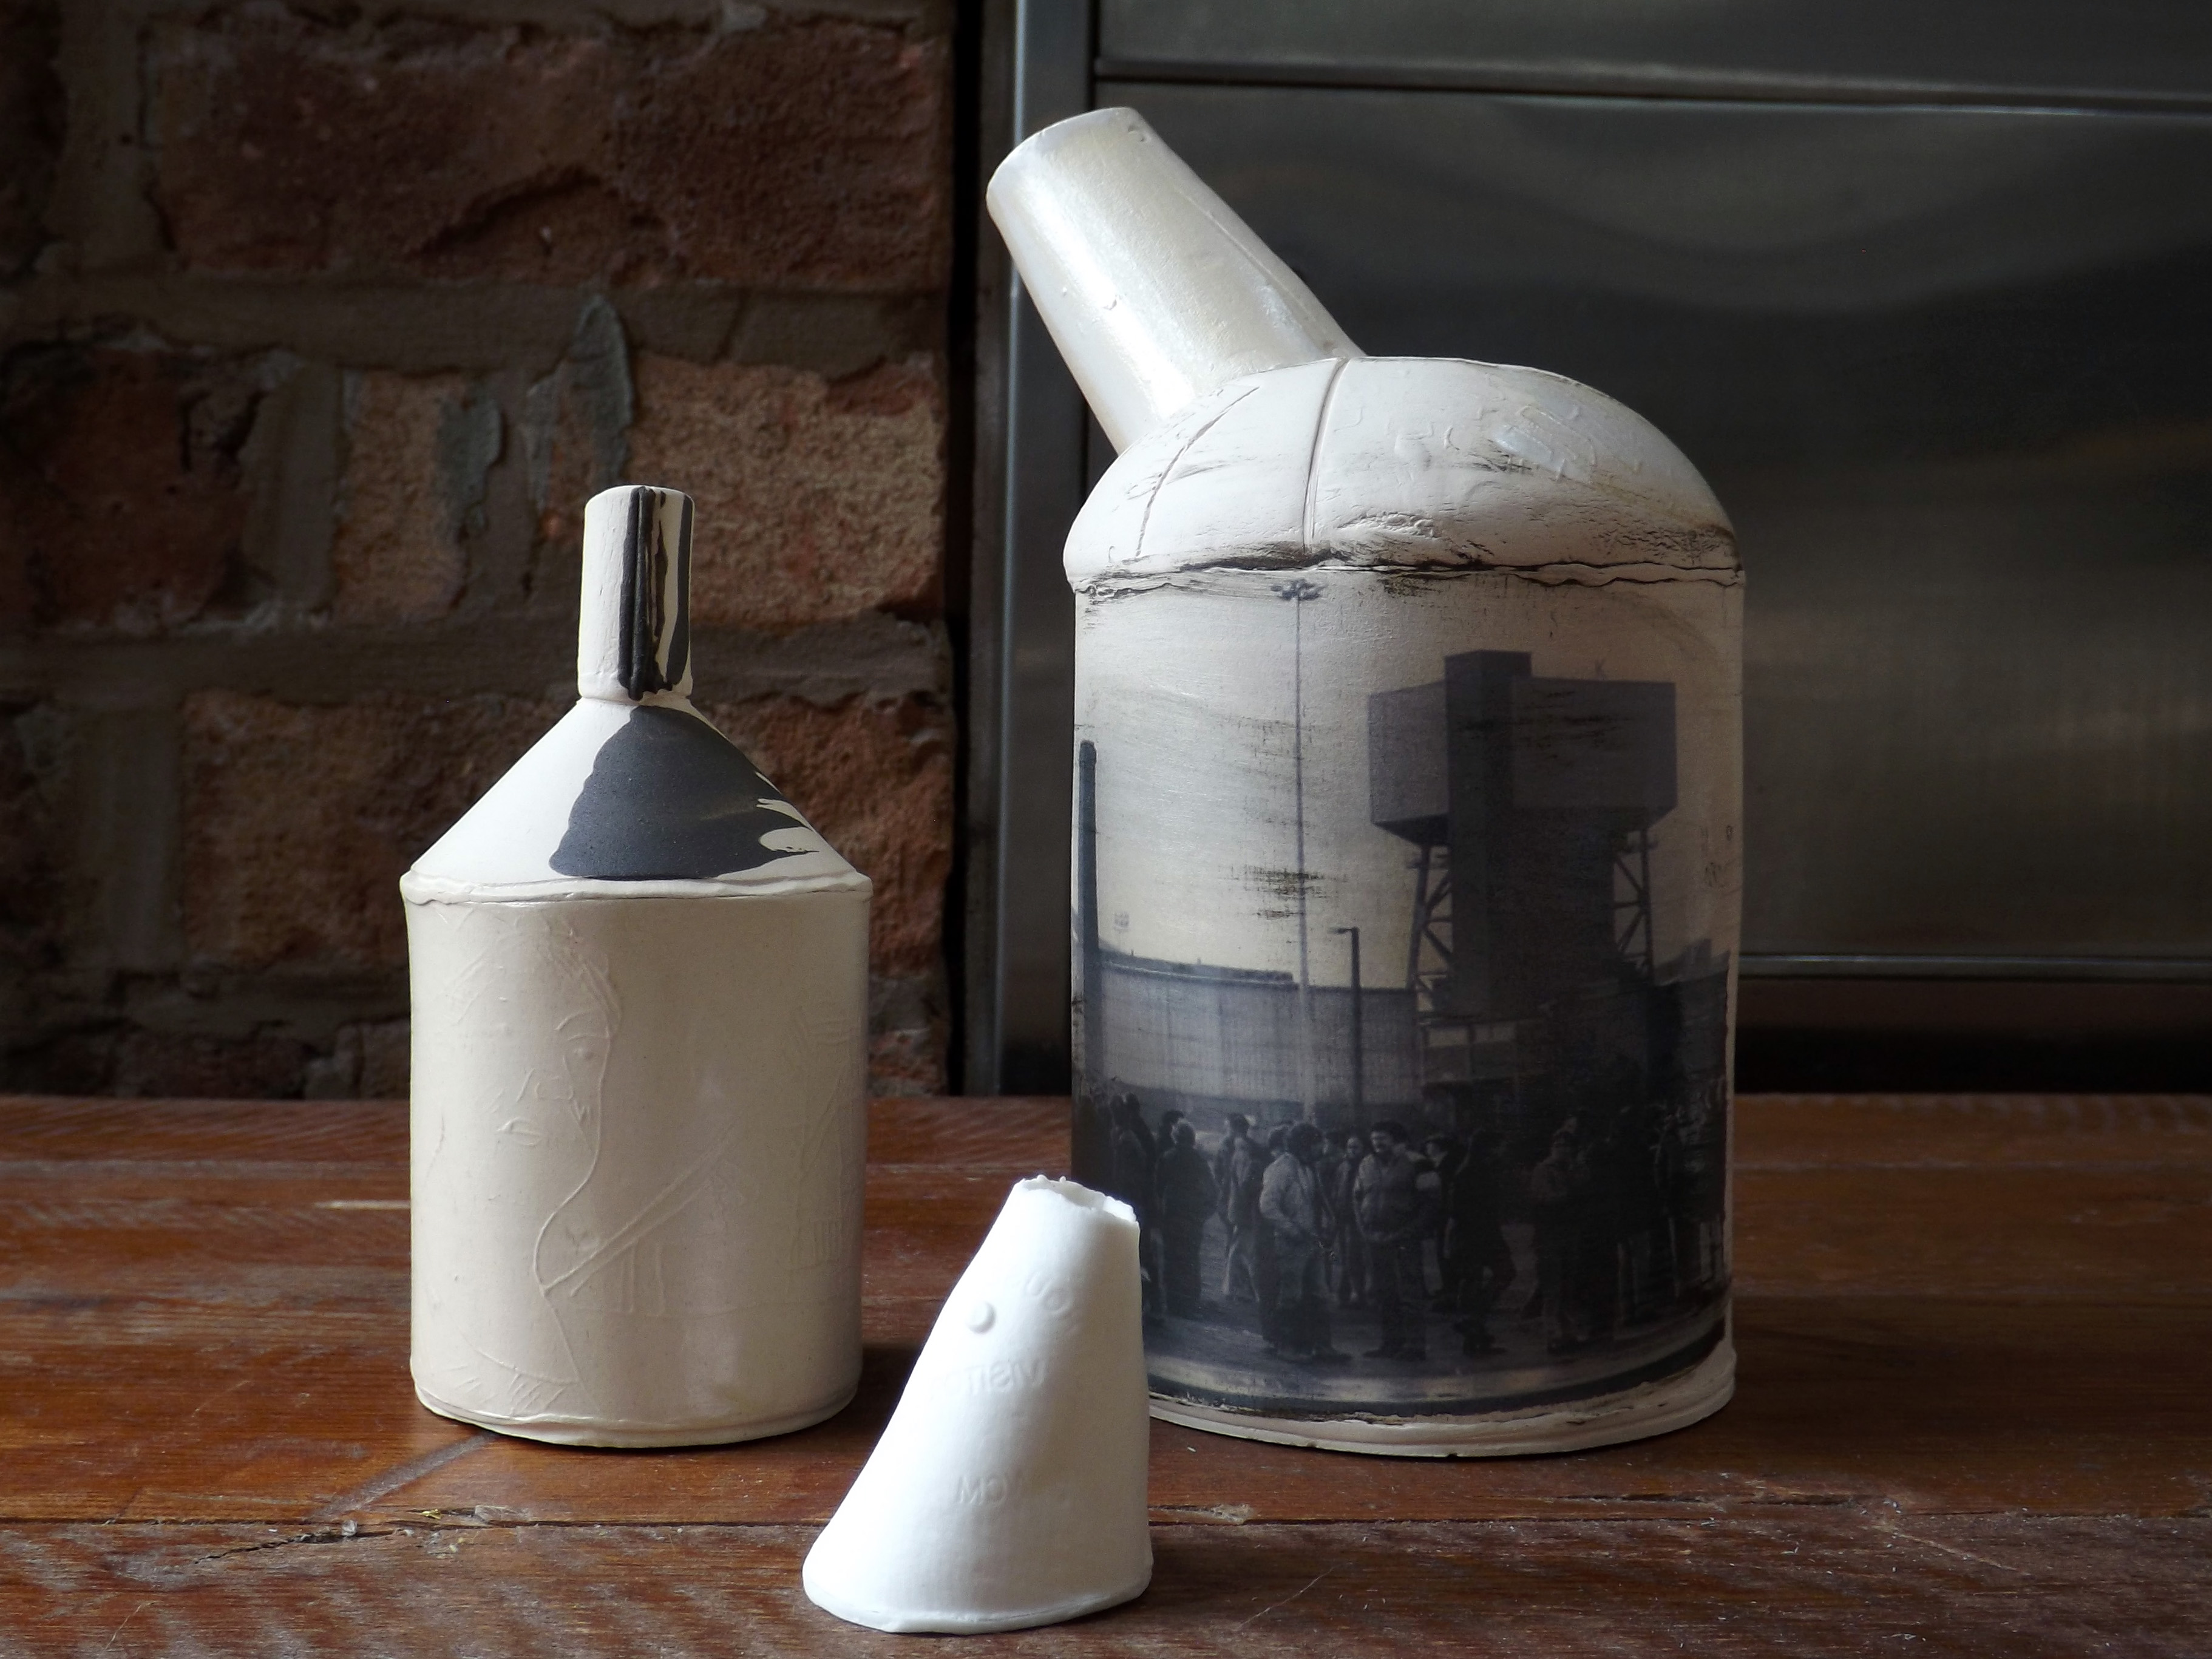 5 Ceramic vessels Stoke-on-Trent